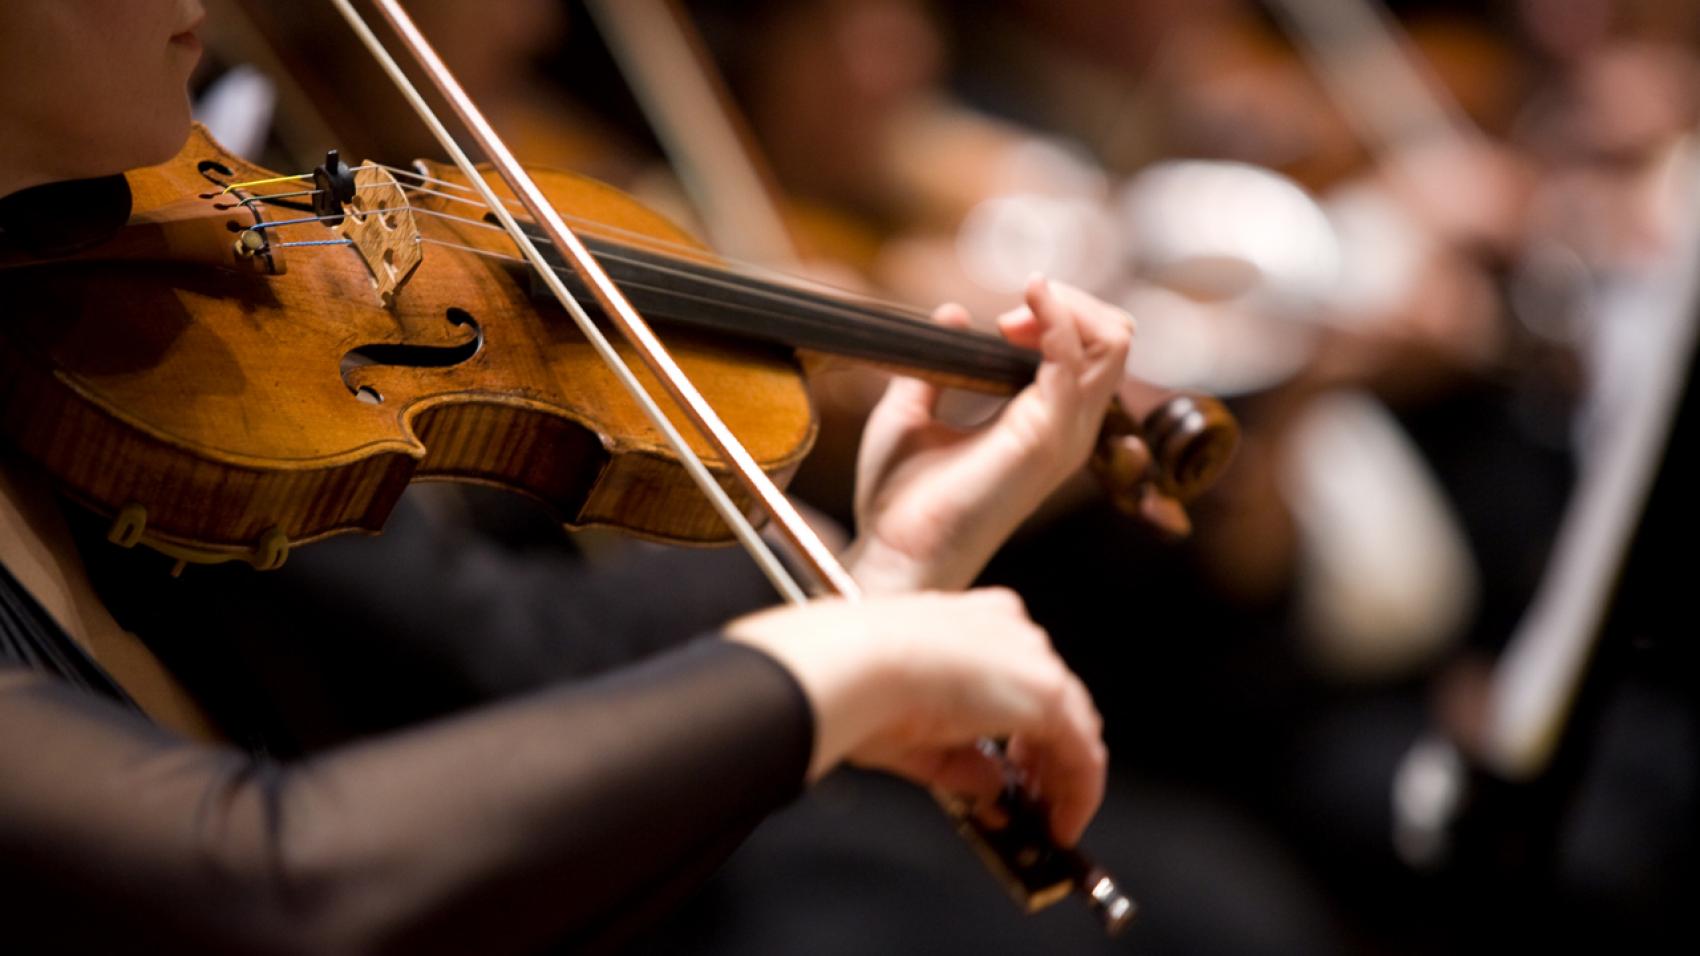 Concertmeester (circa 80%) - Nederlands Philharmonisch Orkest